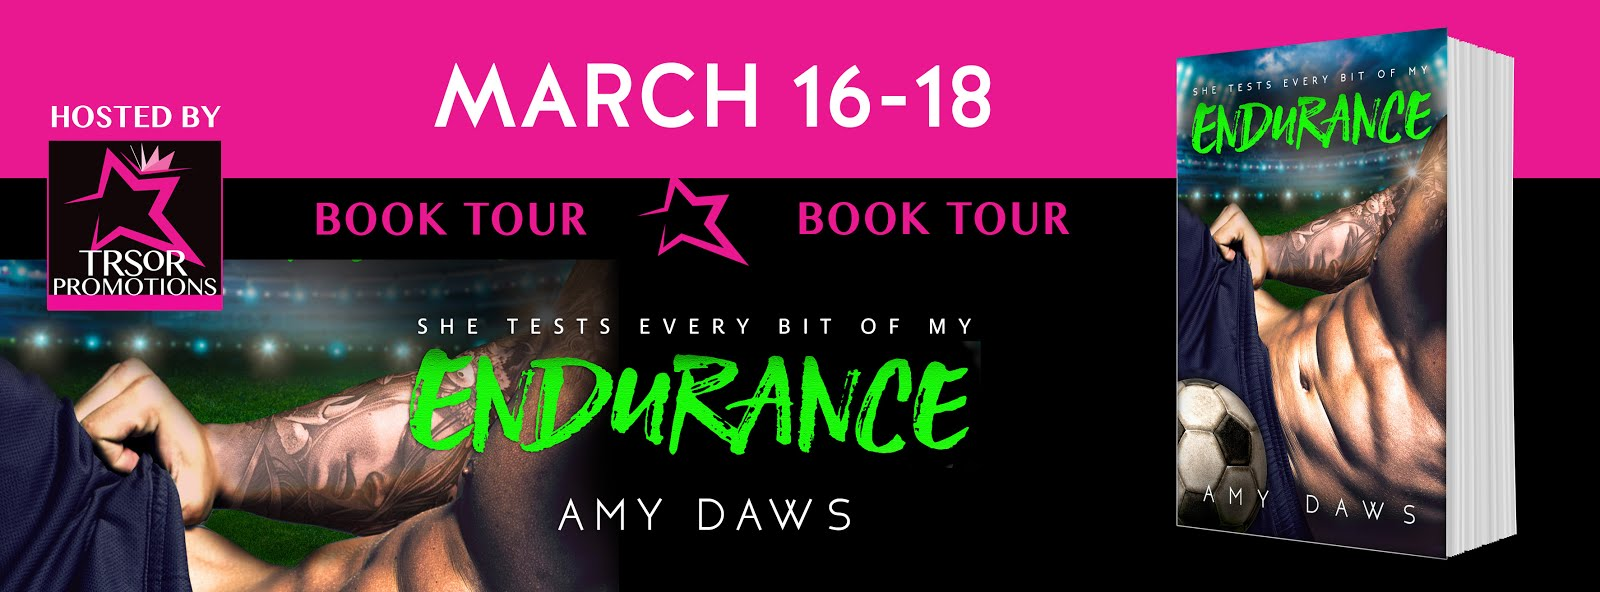 Endurance Blog Tour